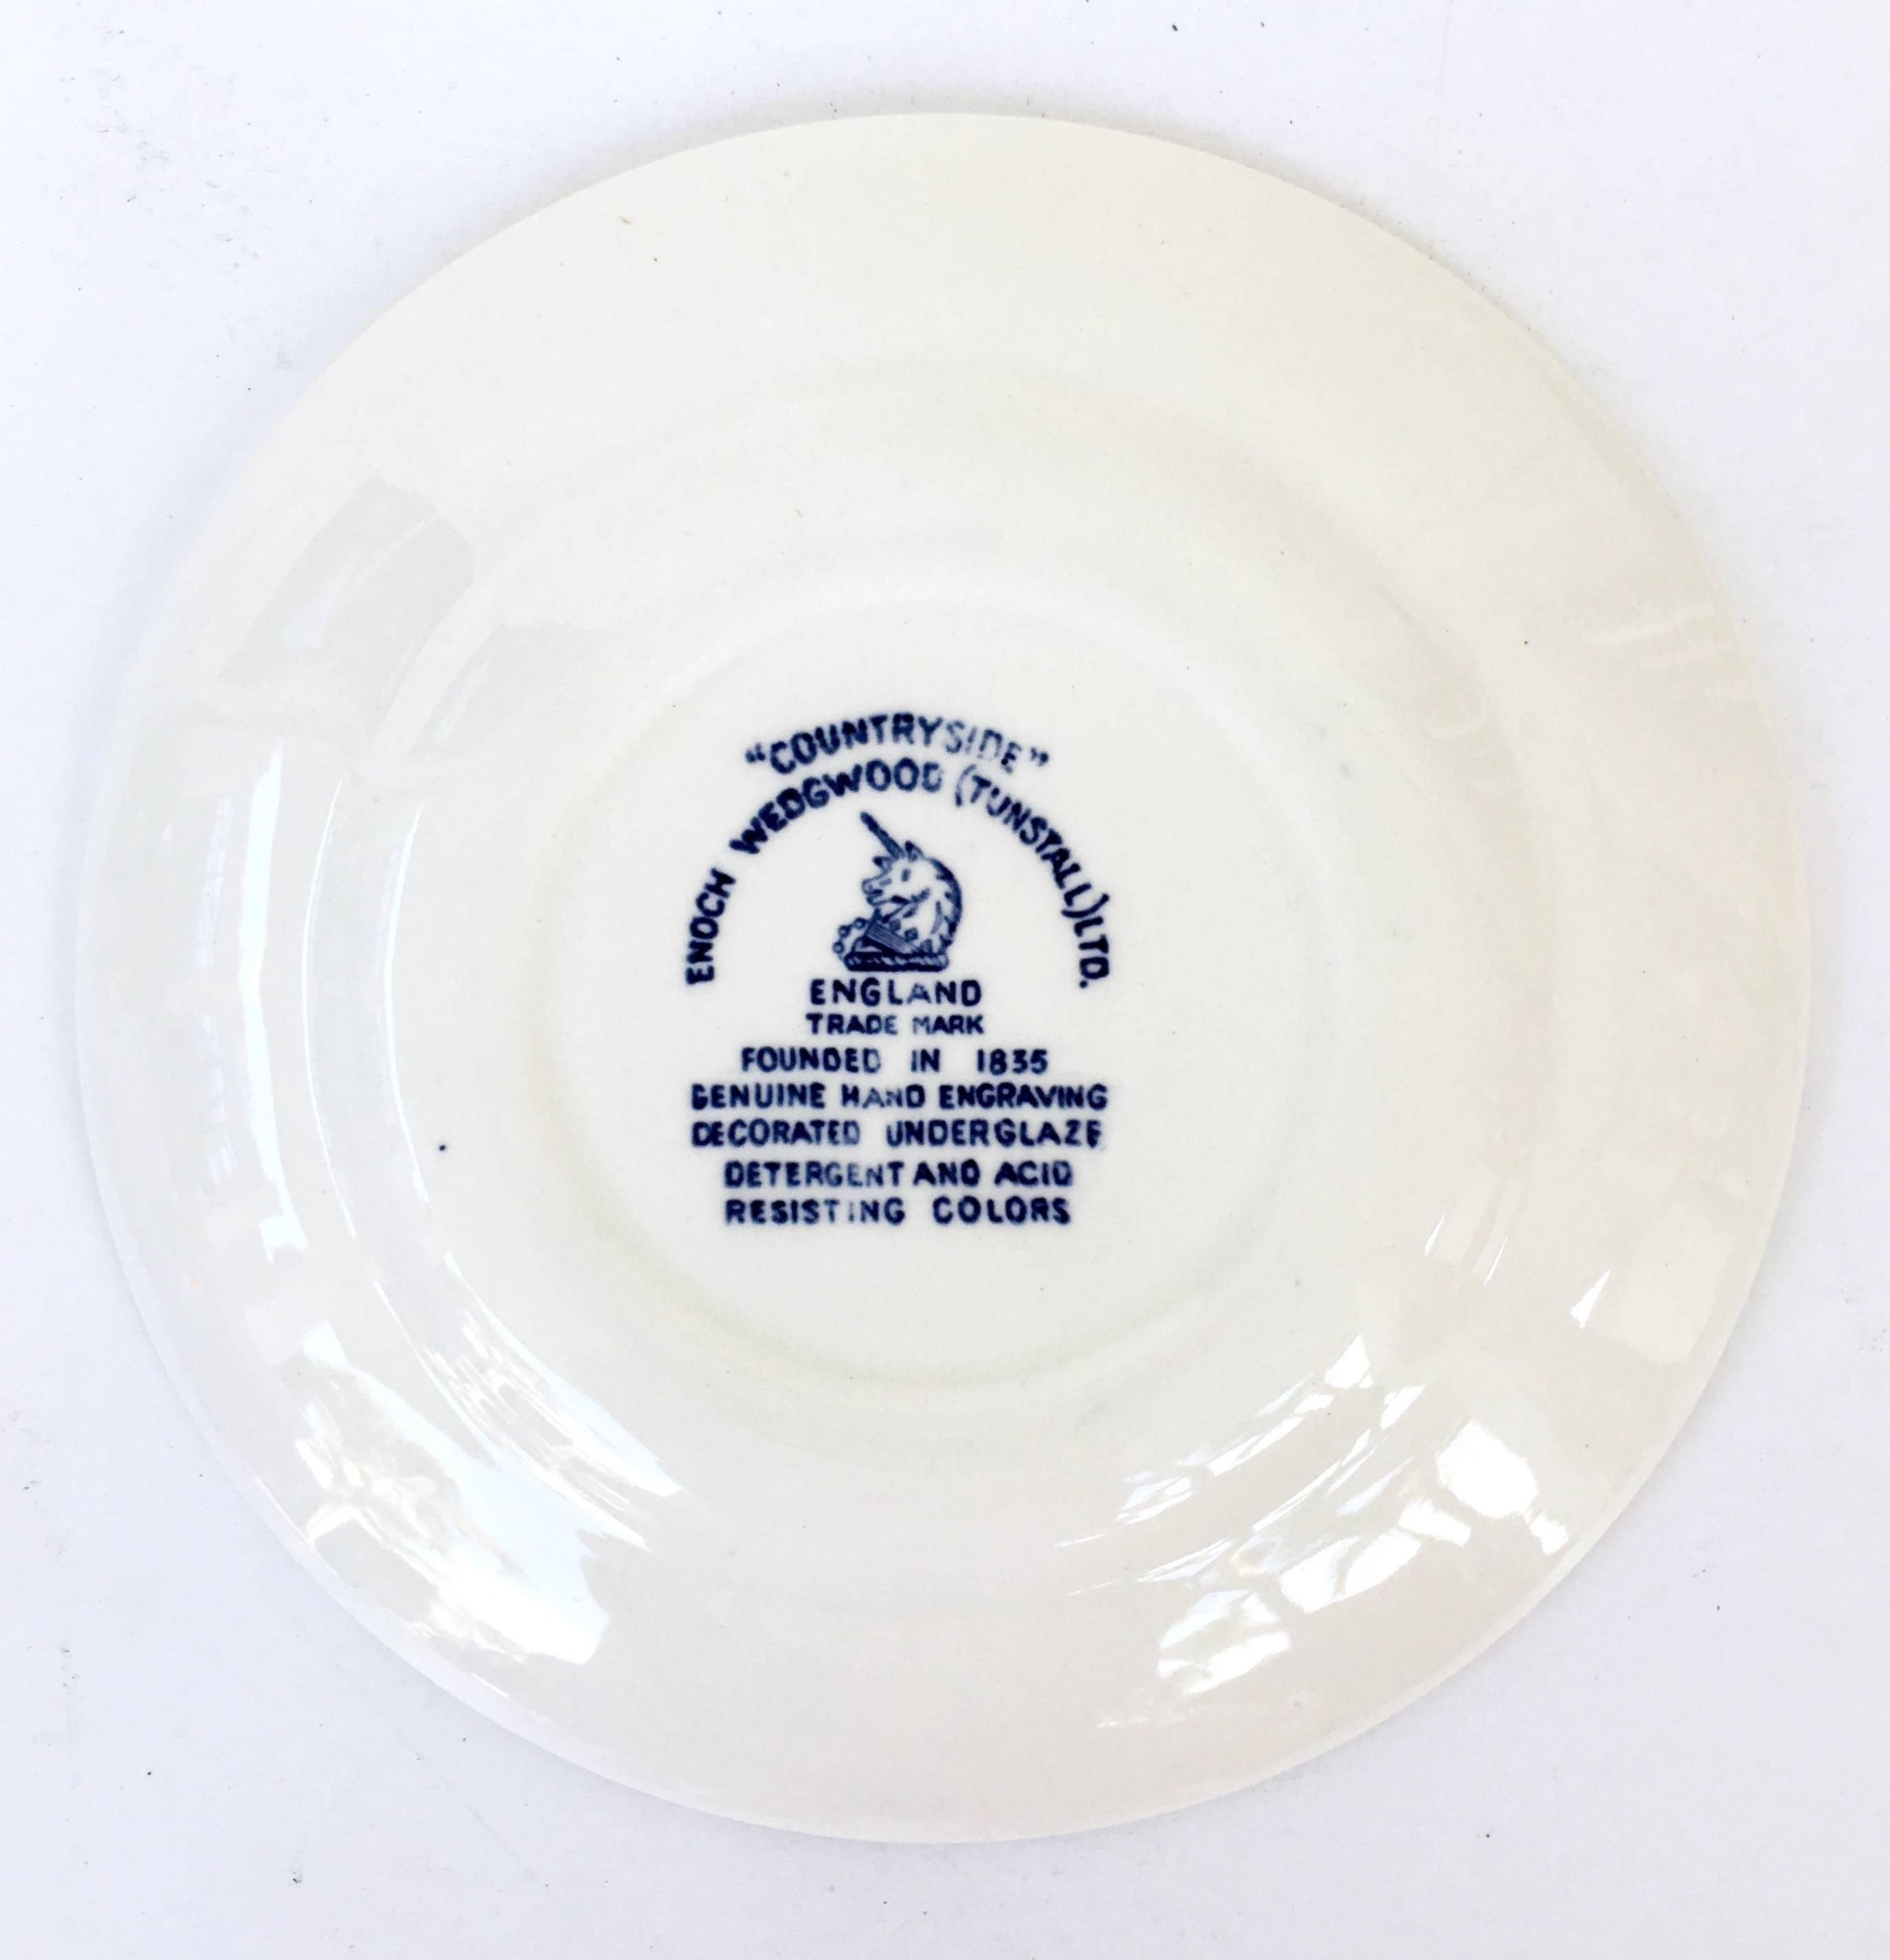 1950s Wedgwood Dinnerware & 1950s Wedgwood Dinnerware